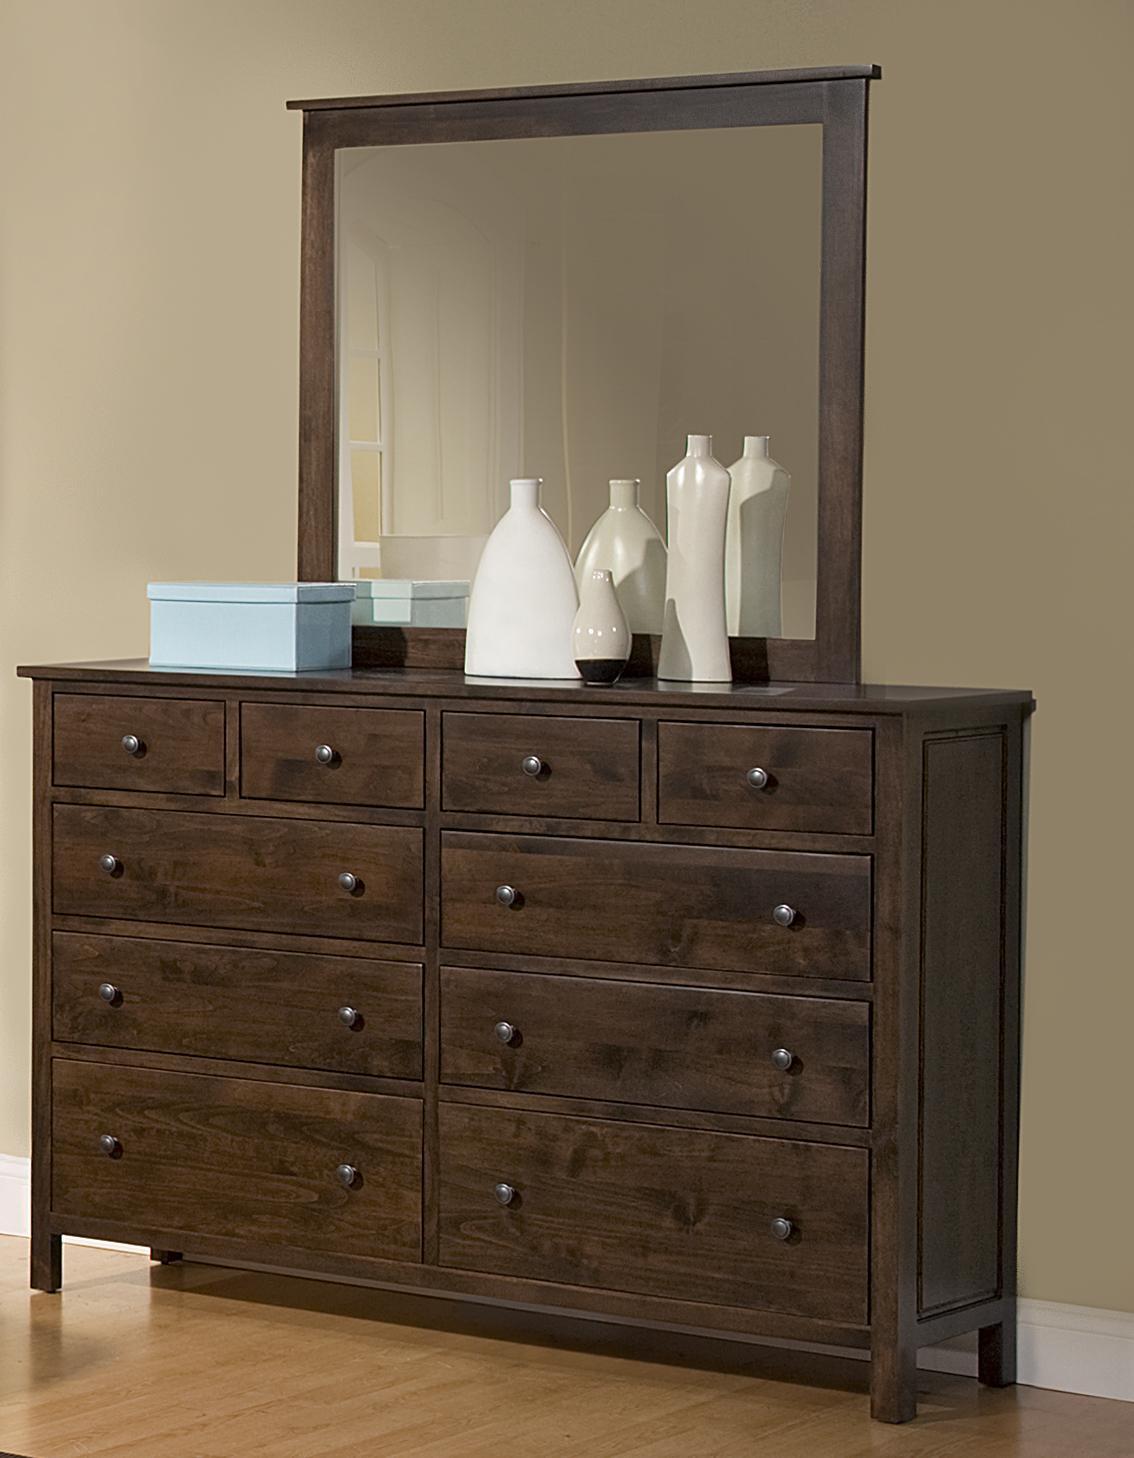 10 Drawer Dresser & Mirror Combo